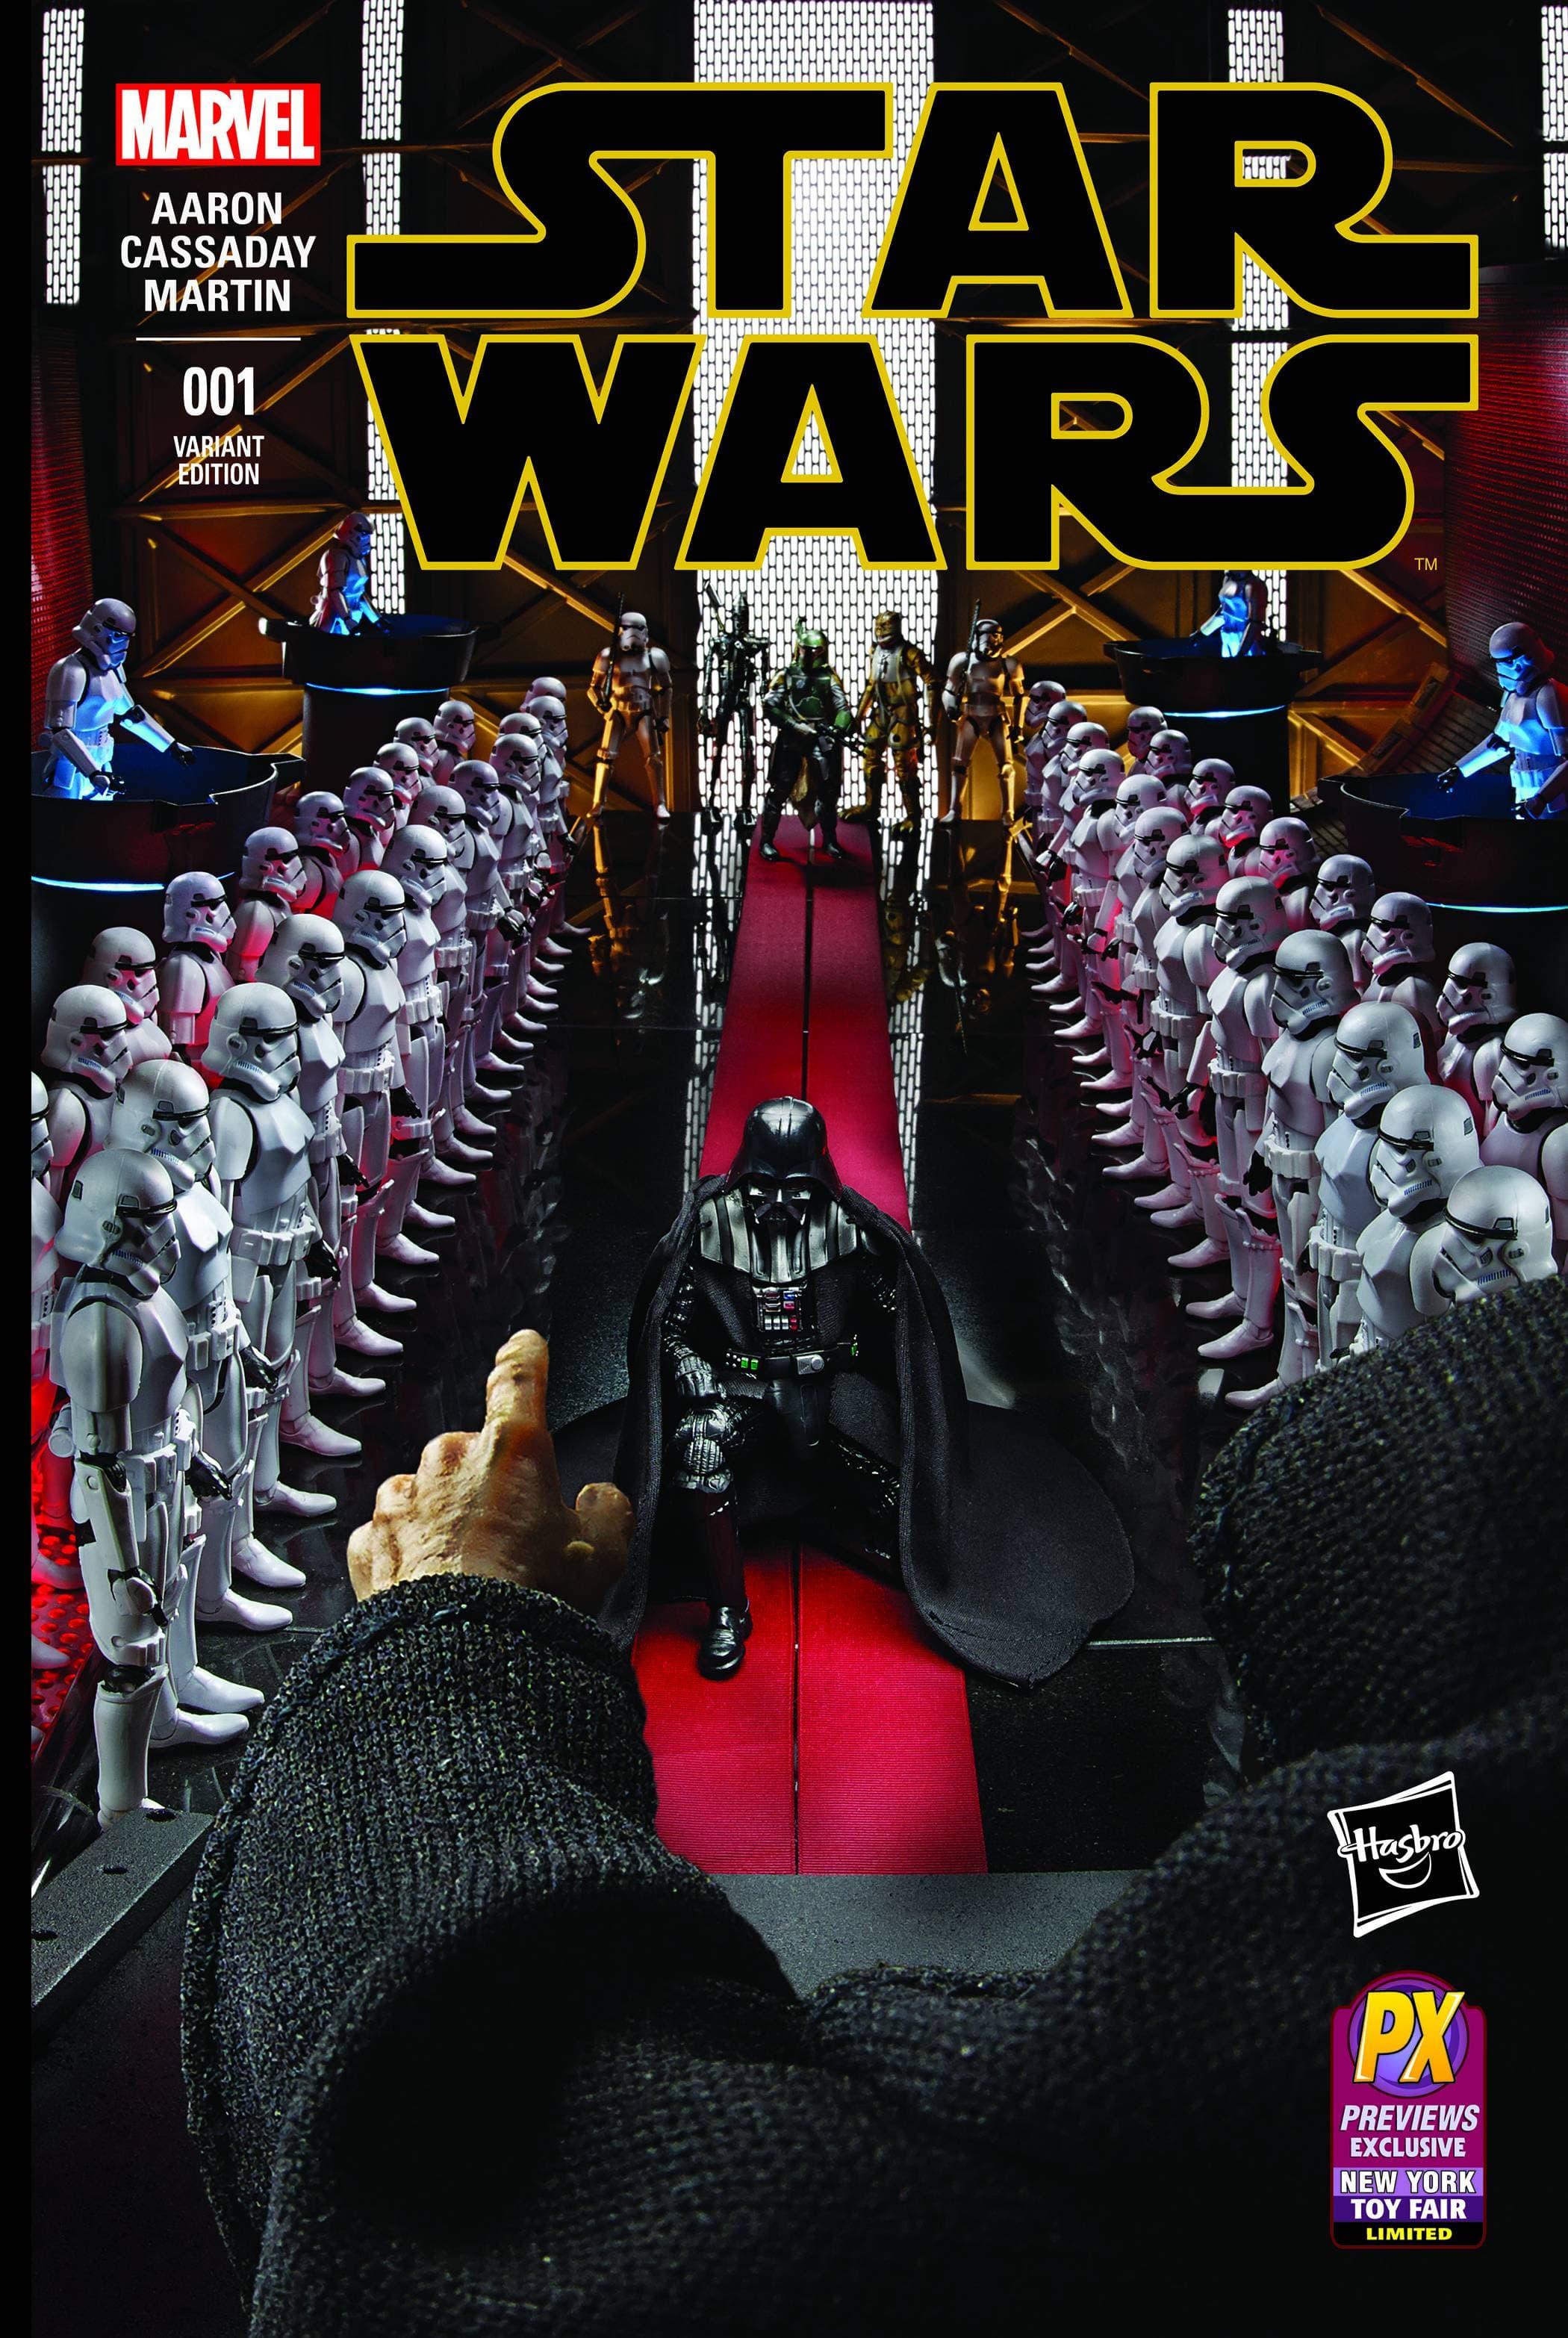 Star Wars #1 (Diamond Comic / Hasbro Exclusive)